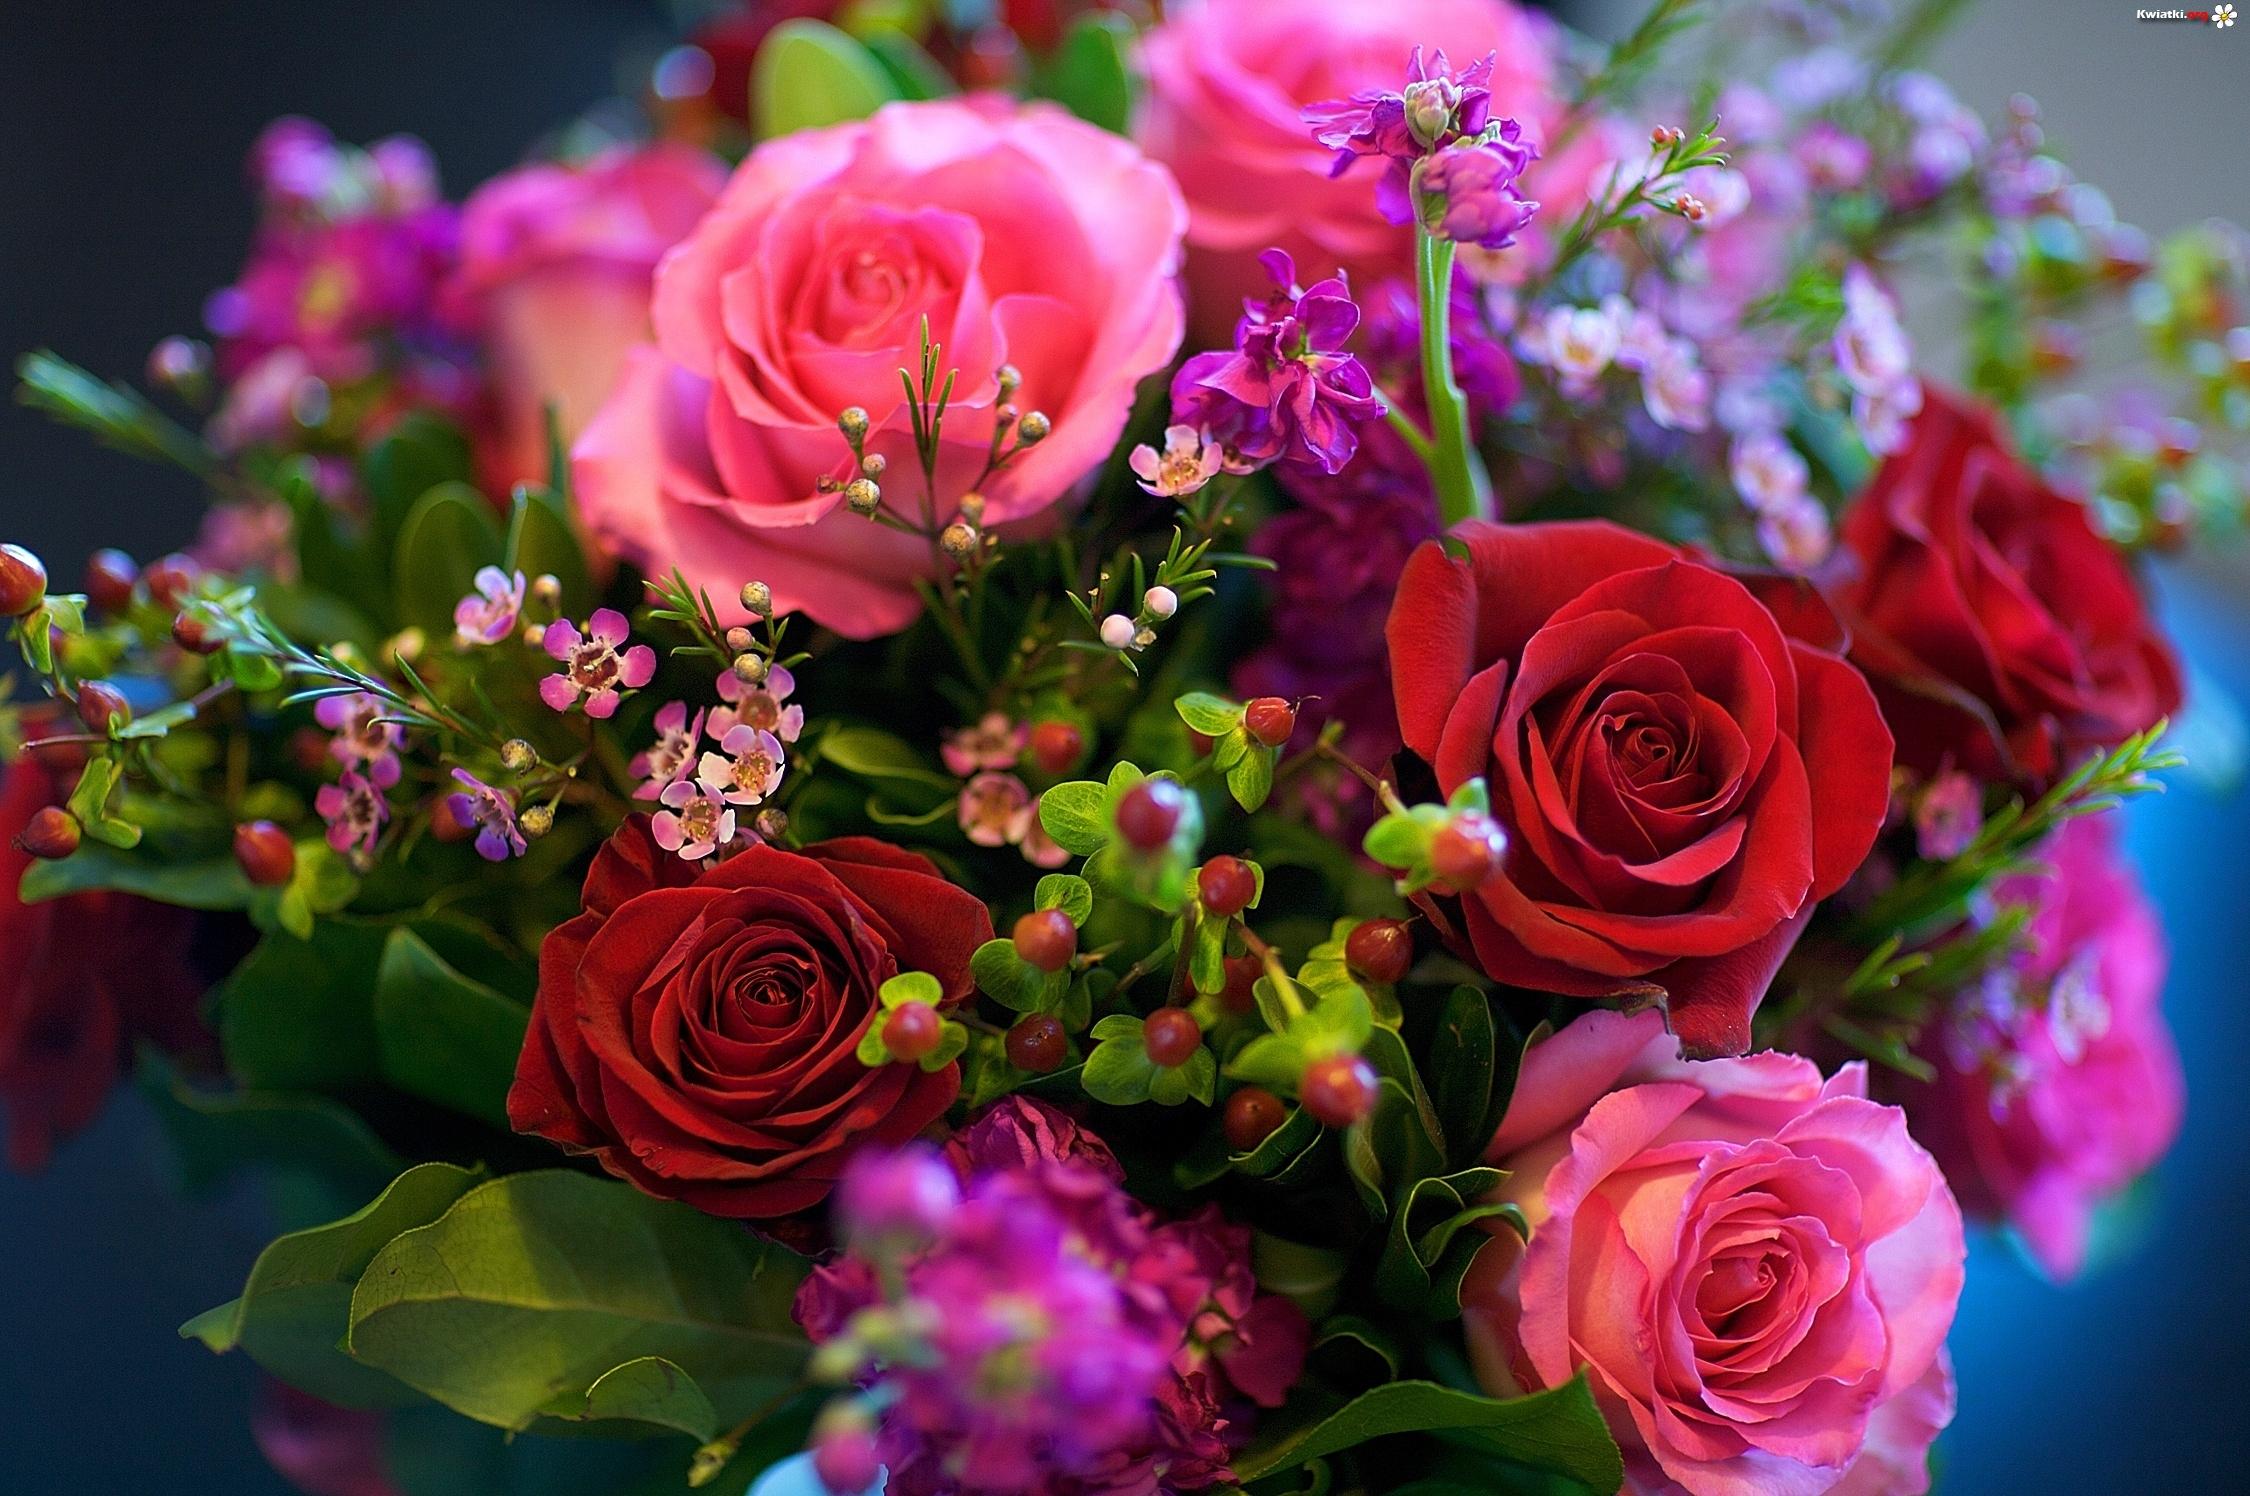 http://www.kwiatki.org/kwiaty/kwiaty-bukiet-4.jpeg